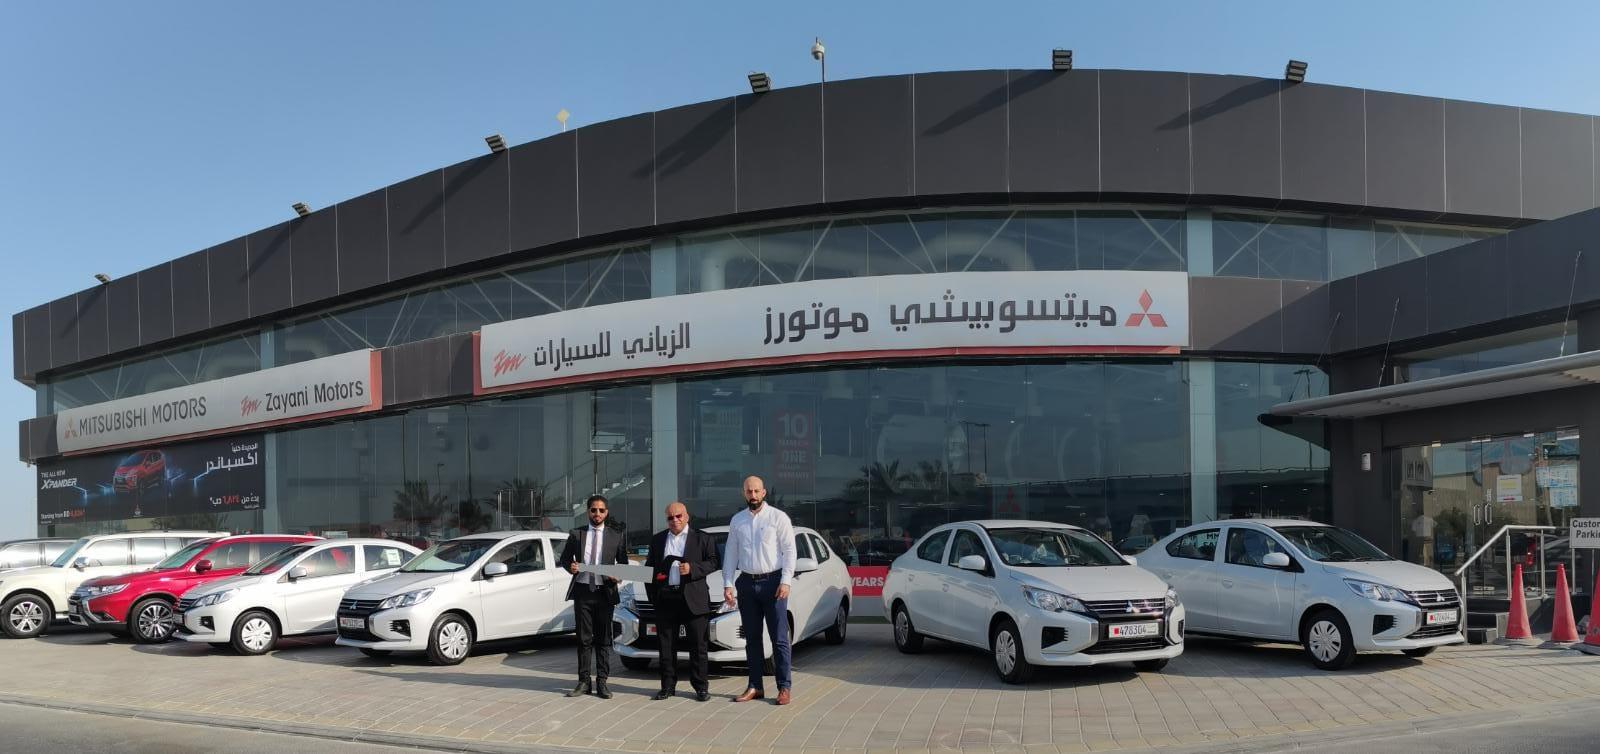 'Zayani Motors' Delivers First Batch of Mitsubishi Vehicles to 'Joubar Machinery Hiring and Cargo'